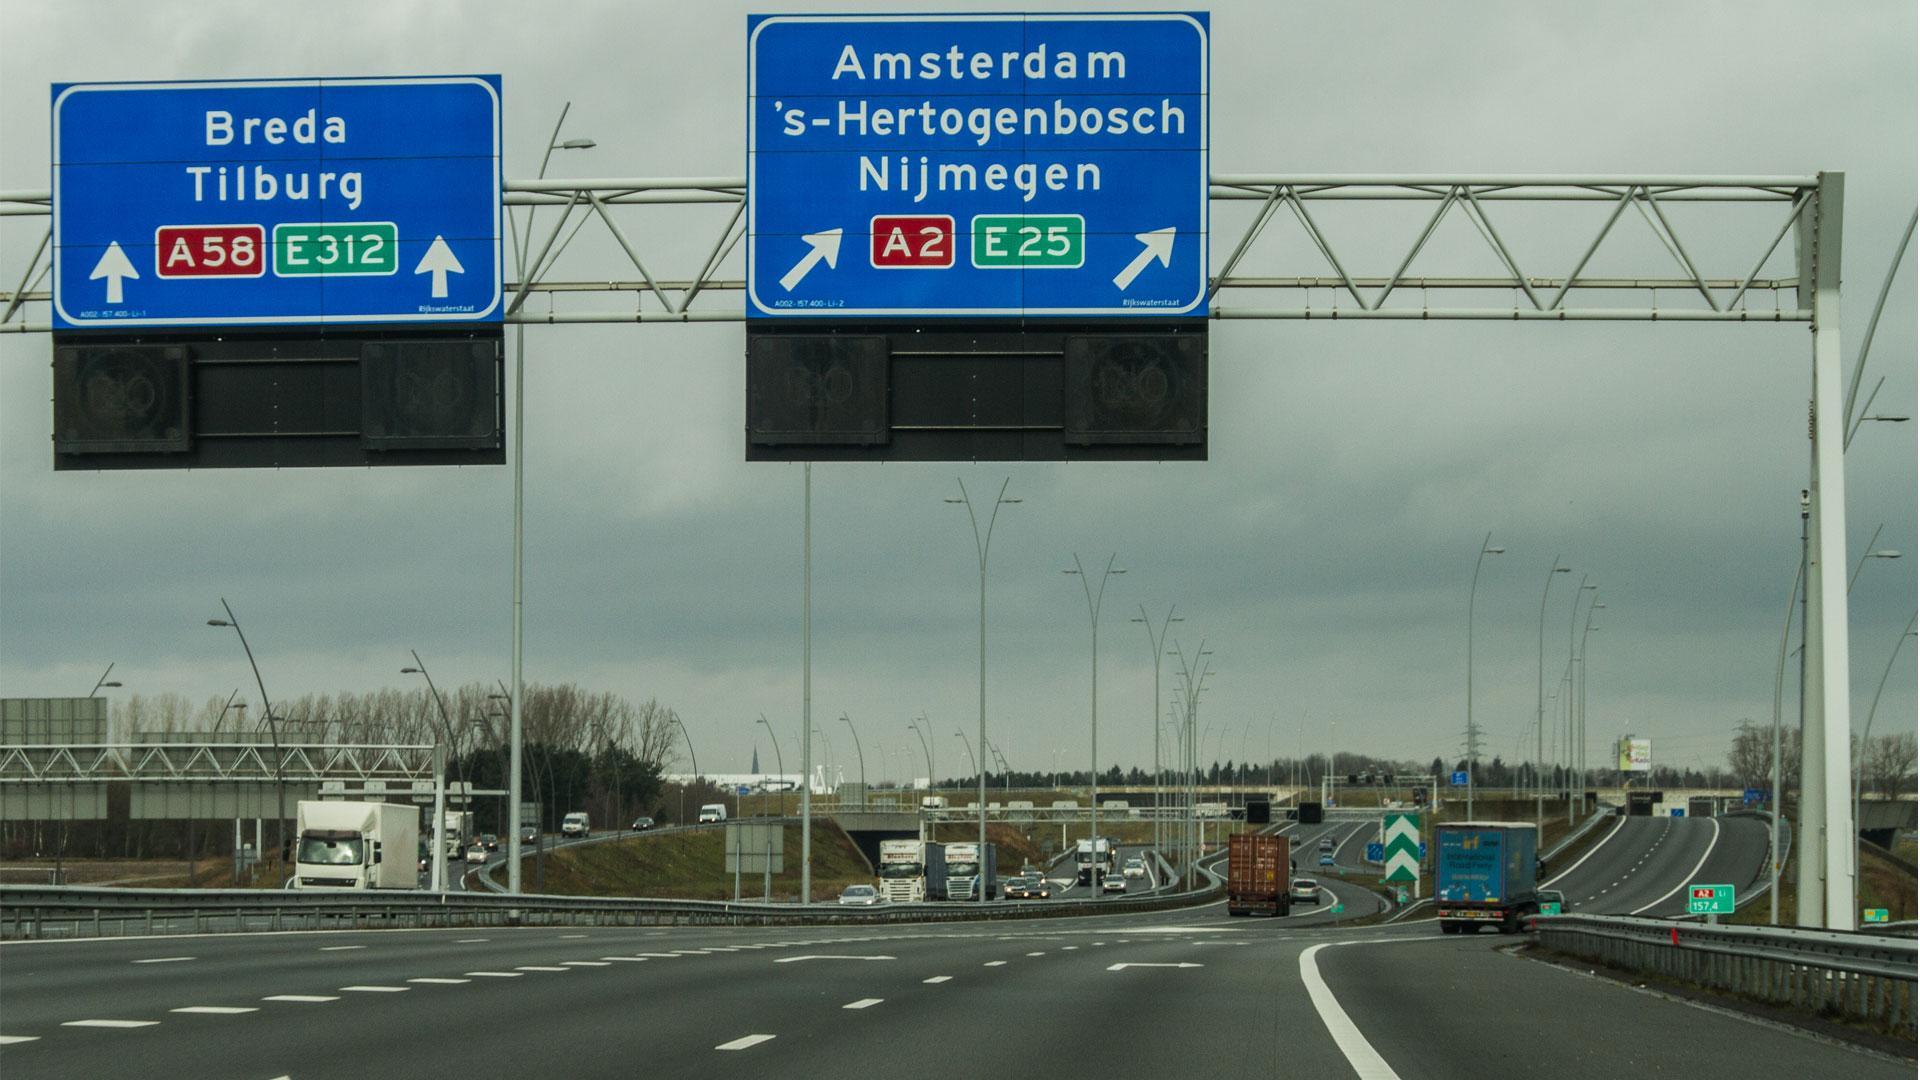 Knooppunt A2 A58